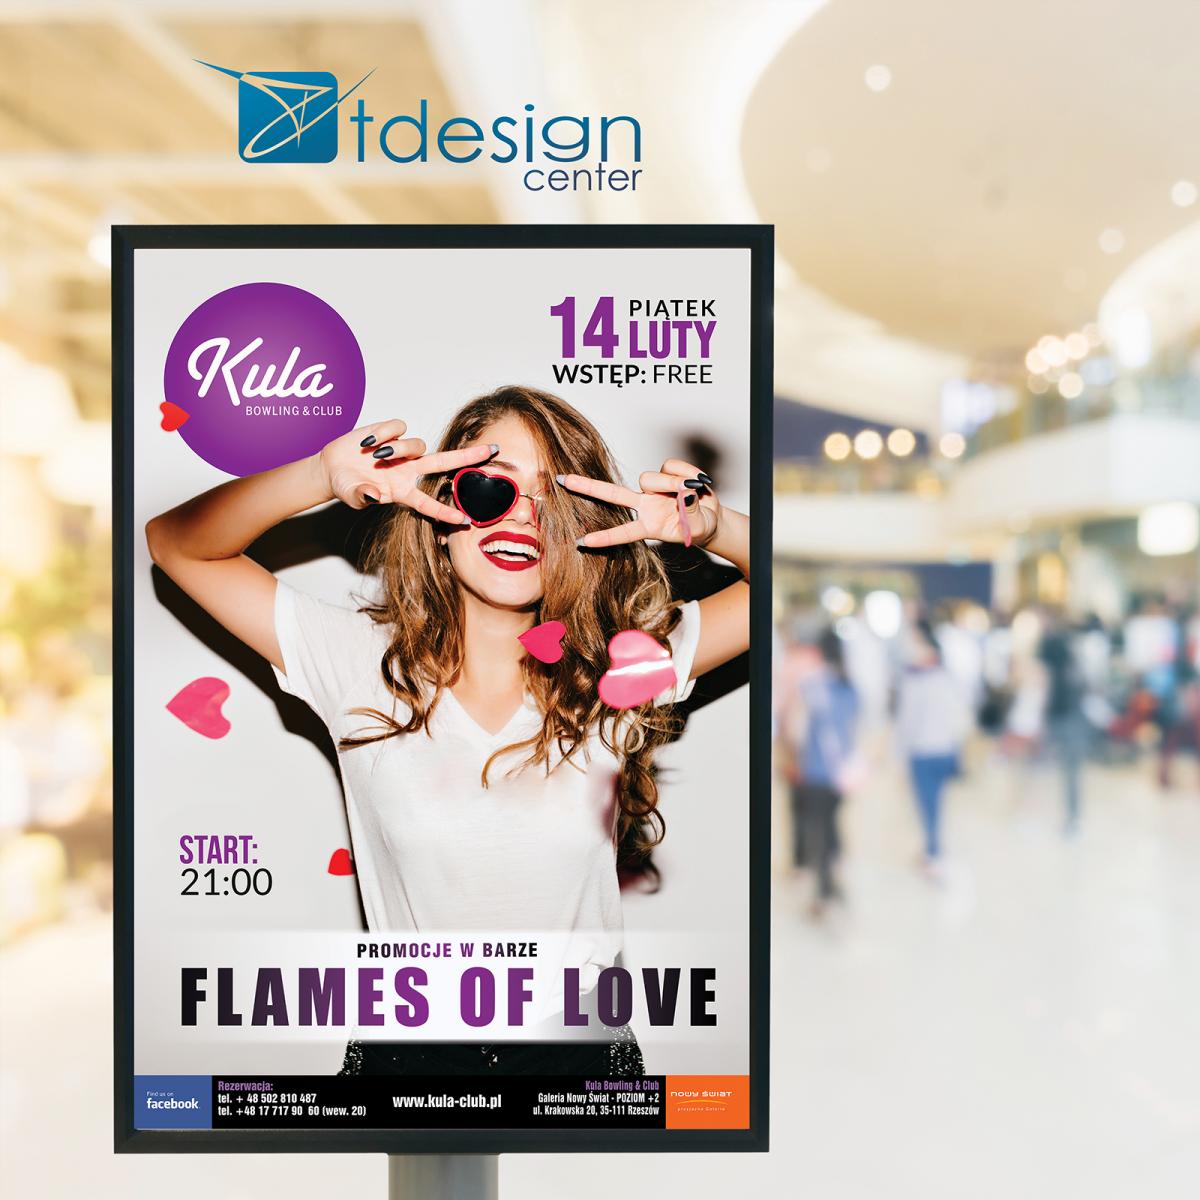 Plakat B1 Flames of Love - projekt wykonany dla kręgielni Kula